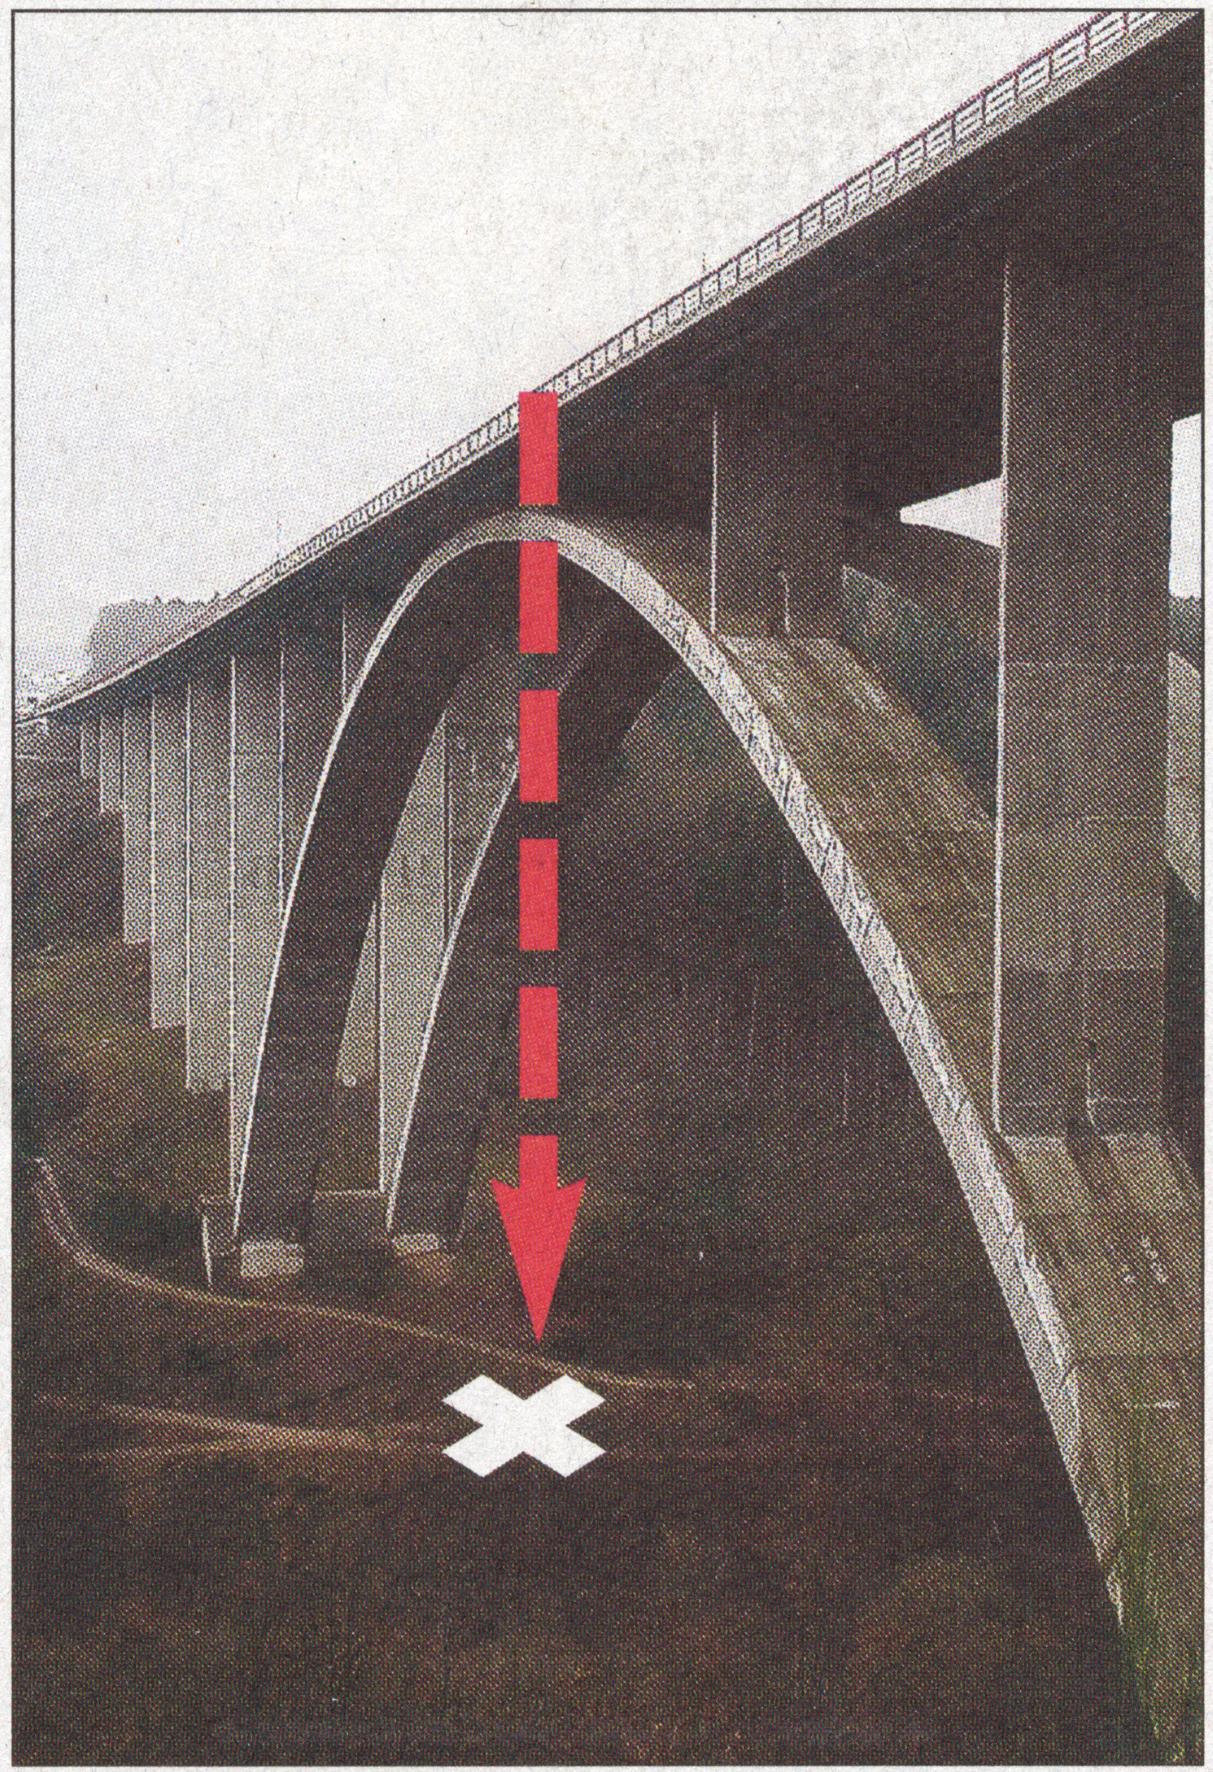 Pfeile # 2 (Arrows) Archiv Peter Piller, 2000 – 2006 (Detail) |  | ProjecteSD